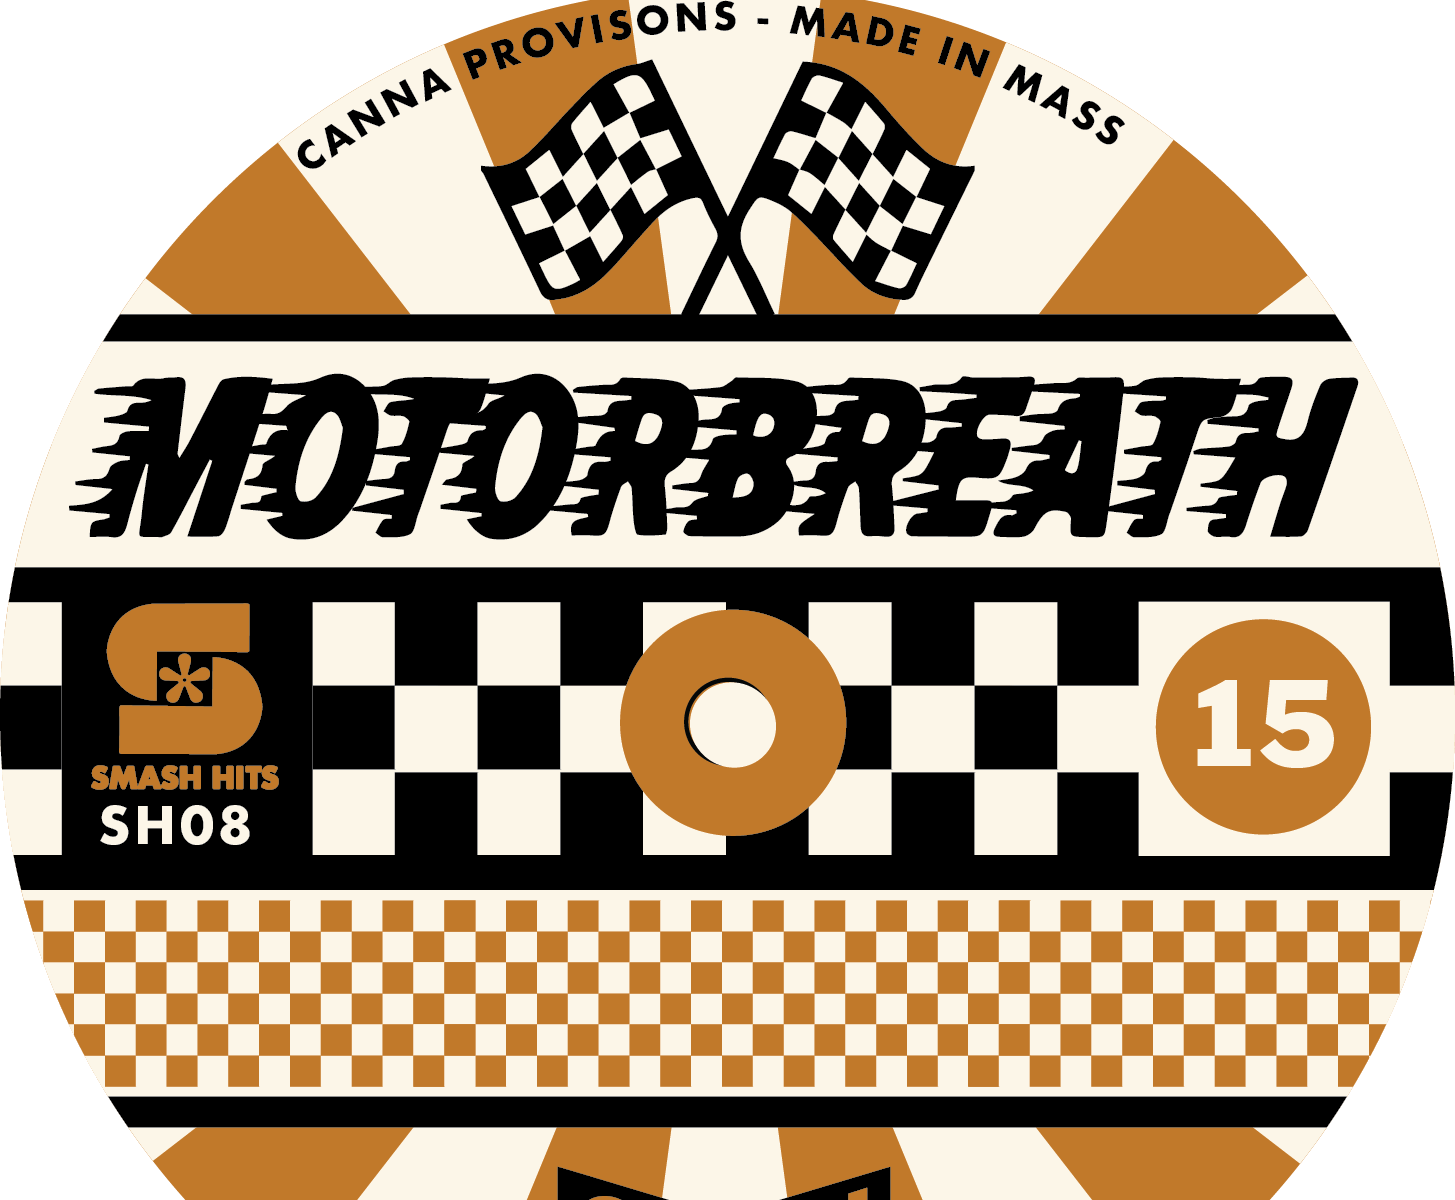 Motorbreath 15 smash hits chemdog canna provisions